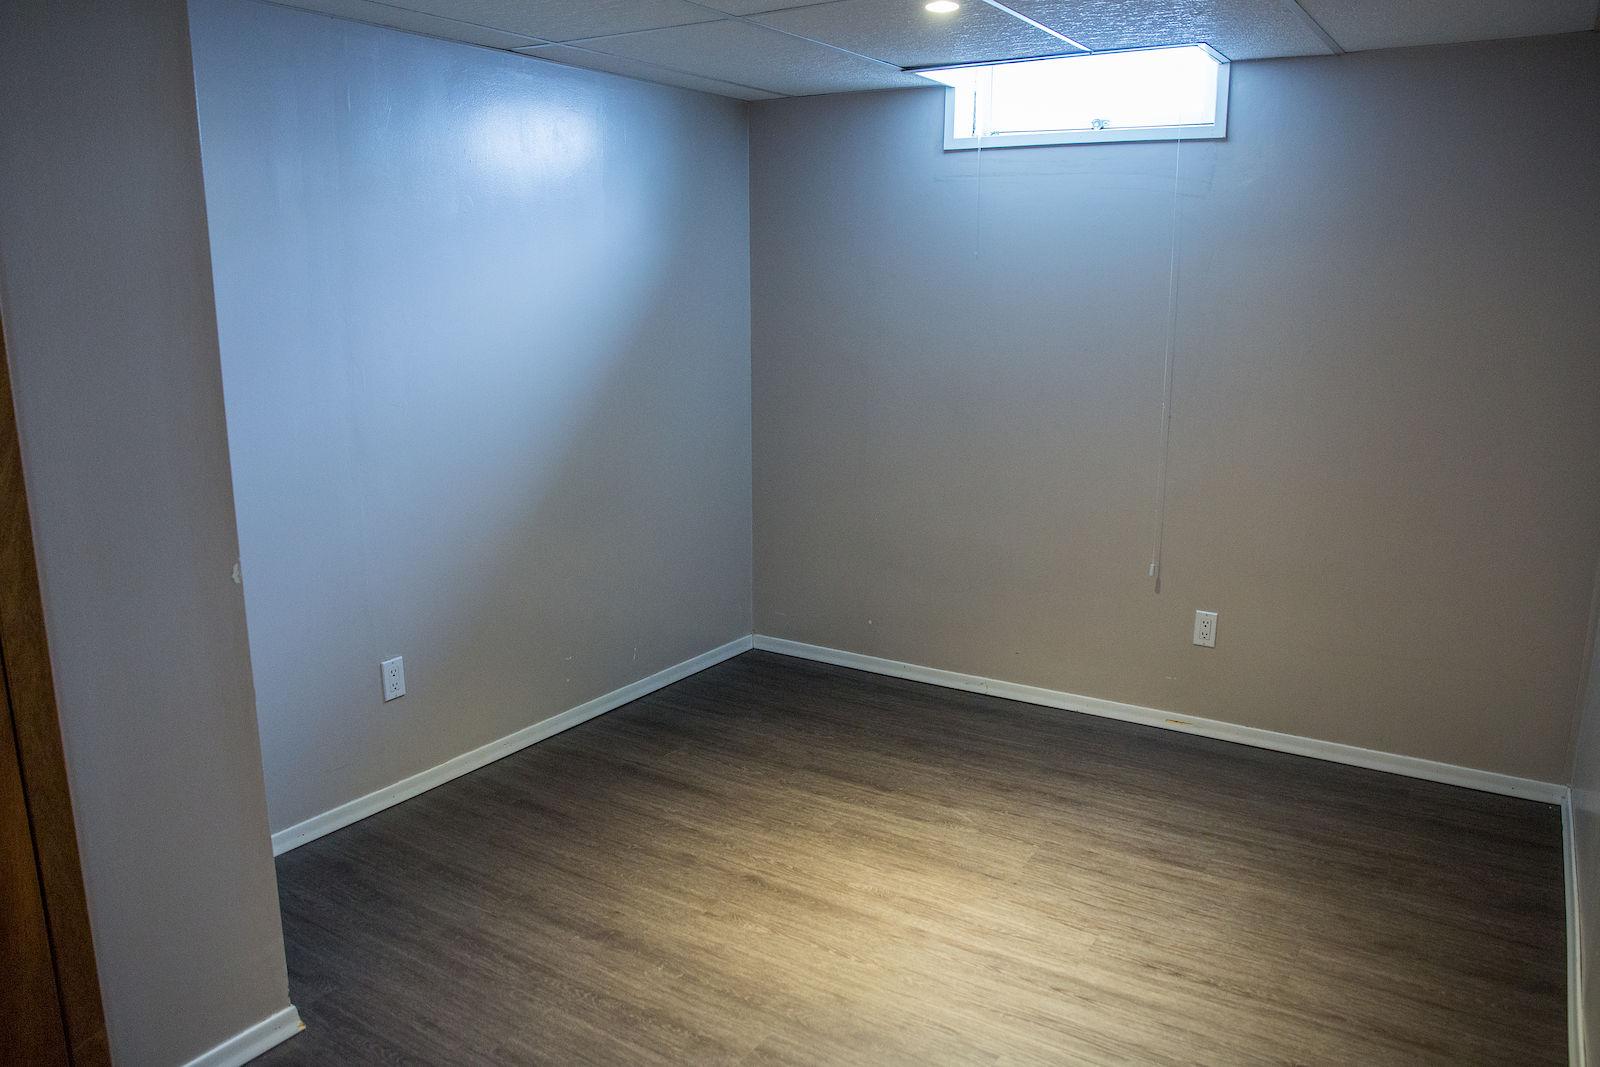 Basement For Rent In Saskatoon saskatoon basement for rent | erindale | 2 bedroom basement suite